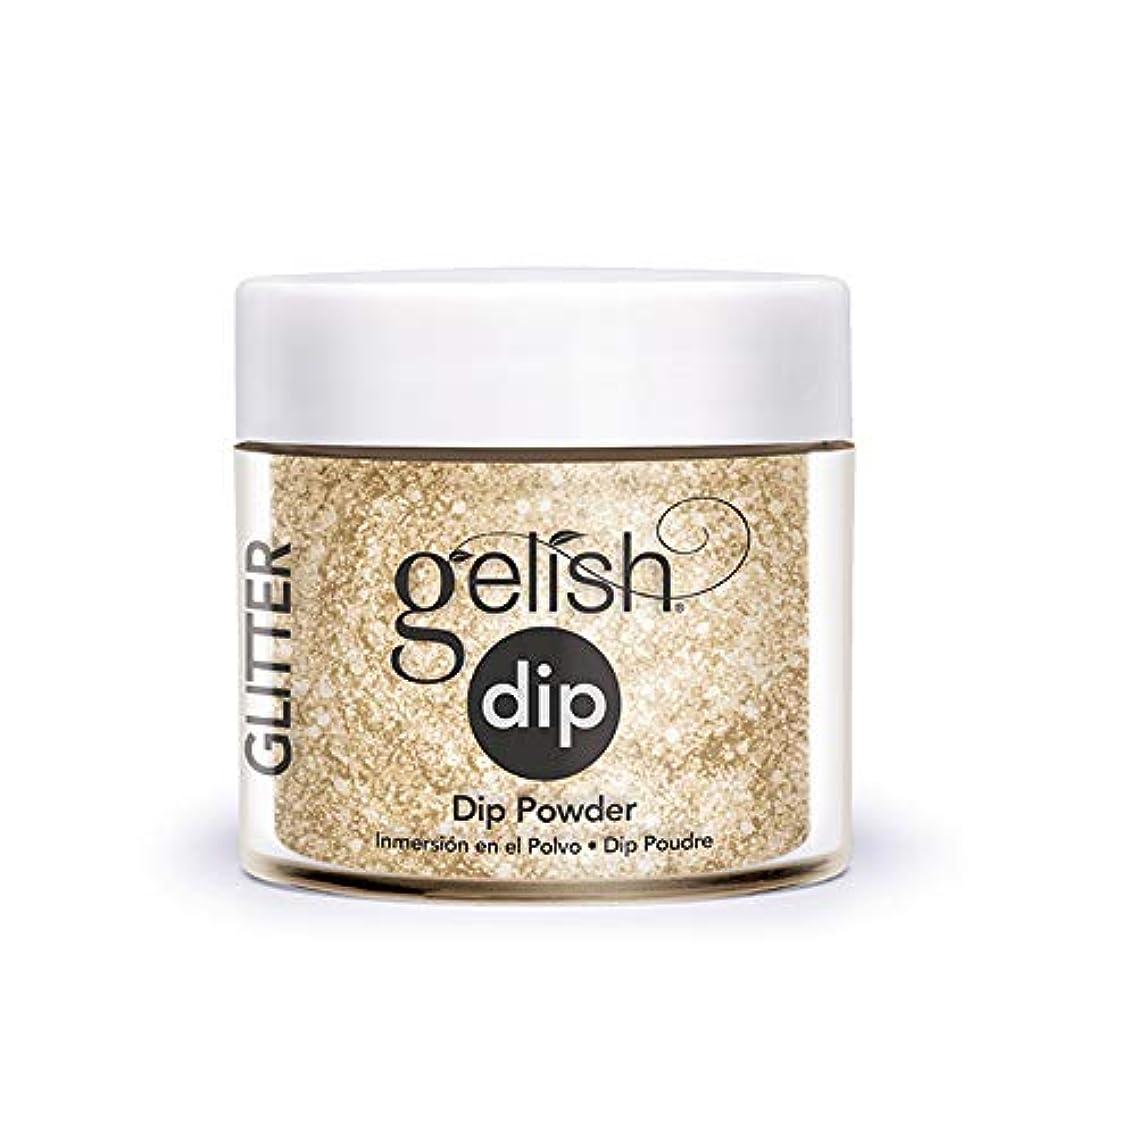 Harmony Gelish - Acrylic Dip Powder - All that Glitters is Gold - 23g / 0.8oz